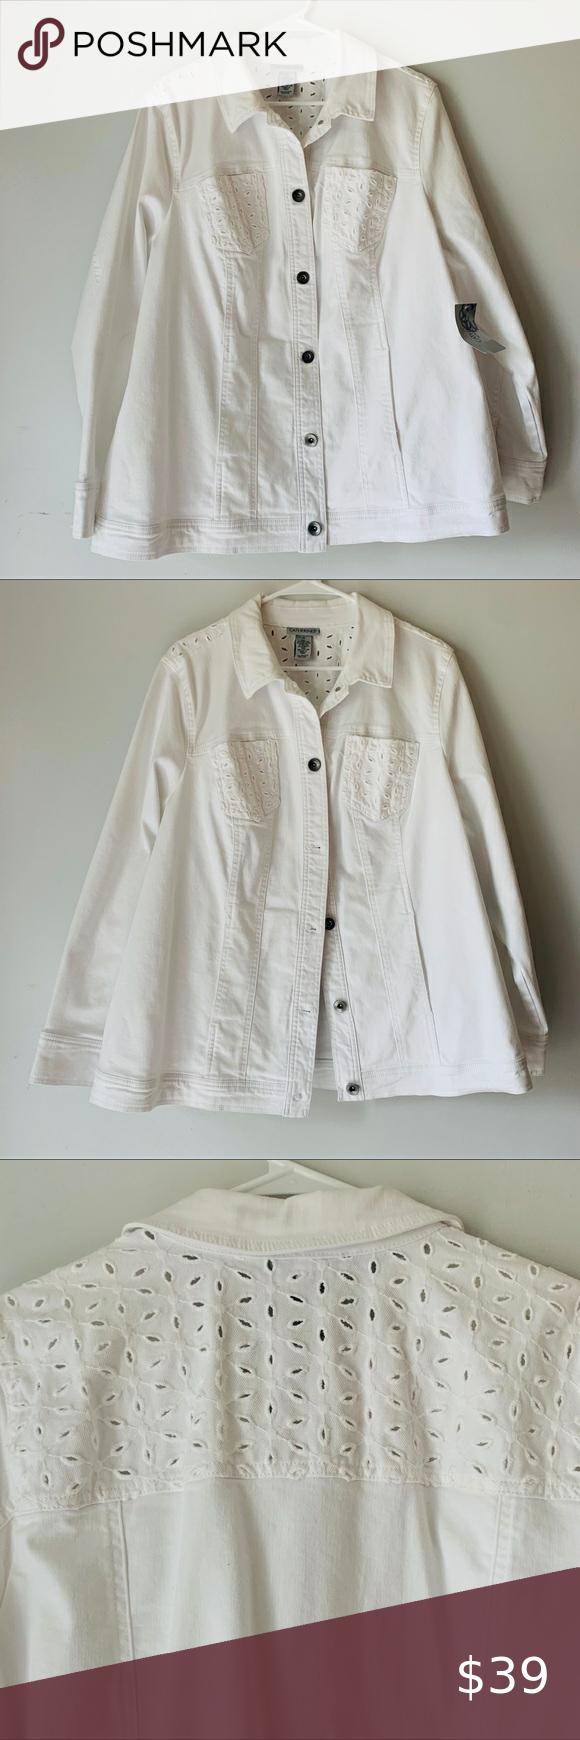 New Catherines Eyelet White Denim Jean Jacket Plus White Denim Jeans White Denim Jean Jacket [ 1740 x 580 Pixel ]